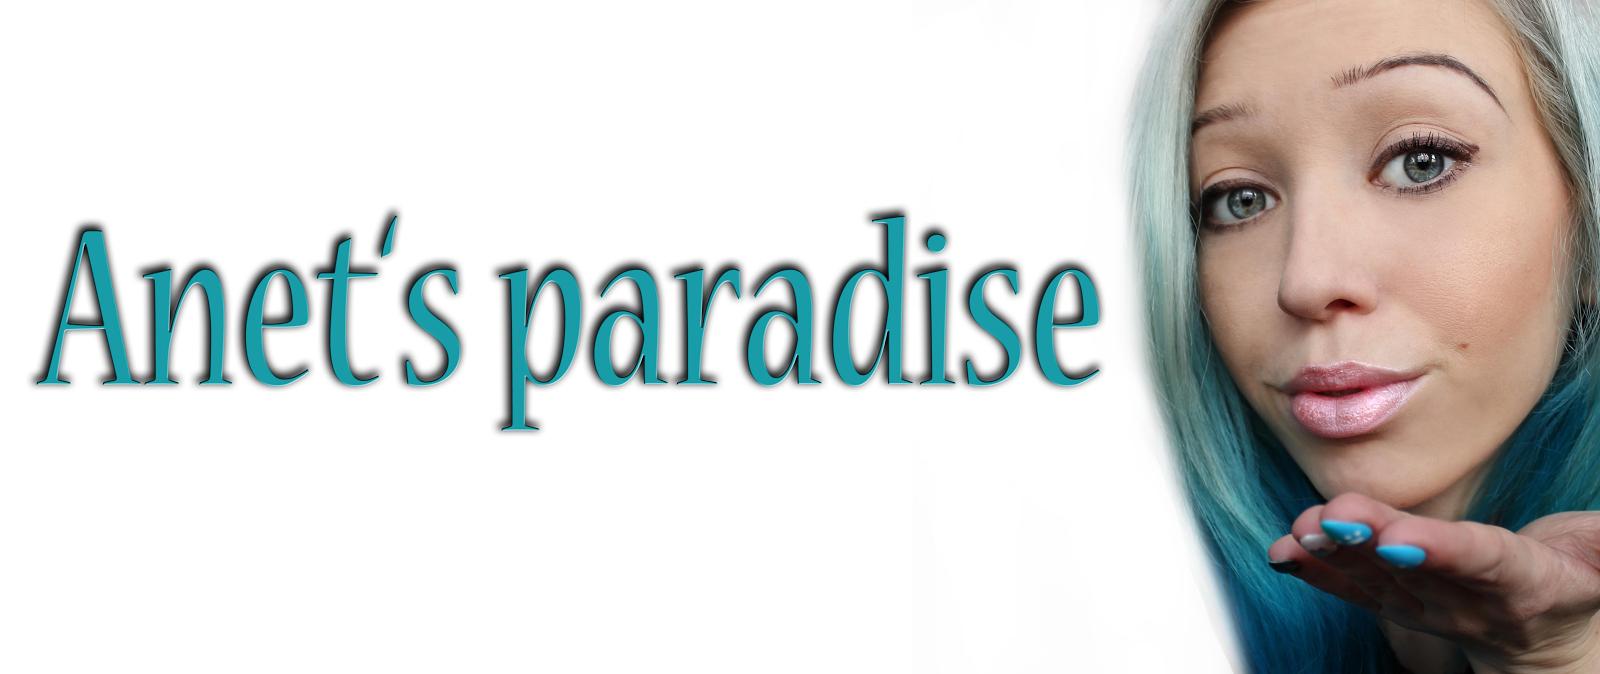 44fbd0247 Anet's paradise - my hobbies: Cez ružové okuliare :) extravagantné ...